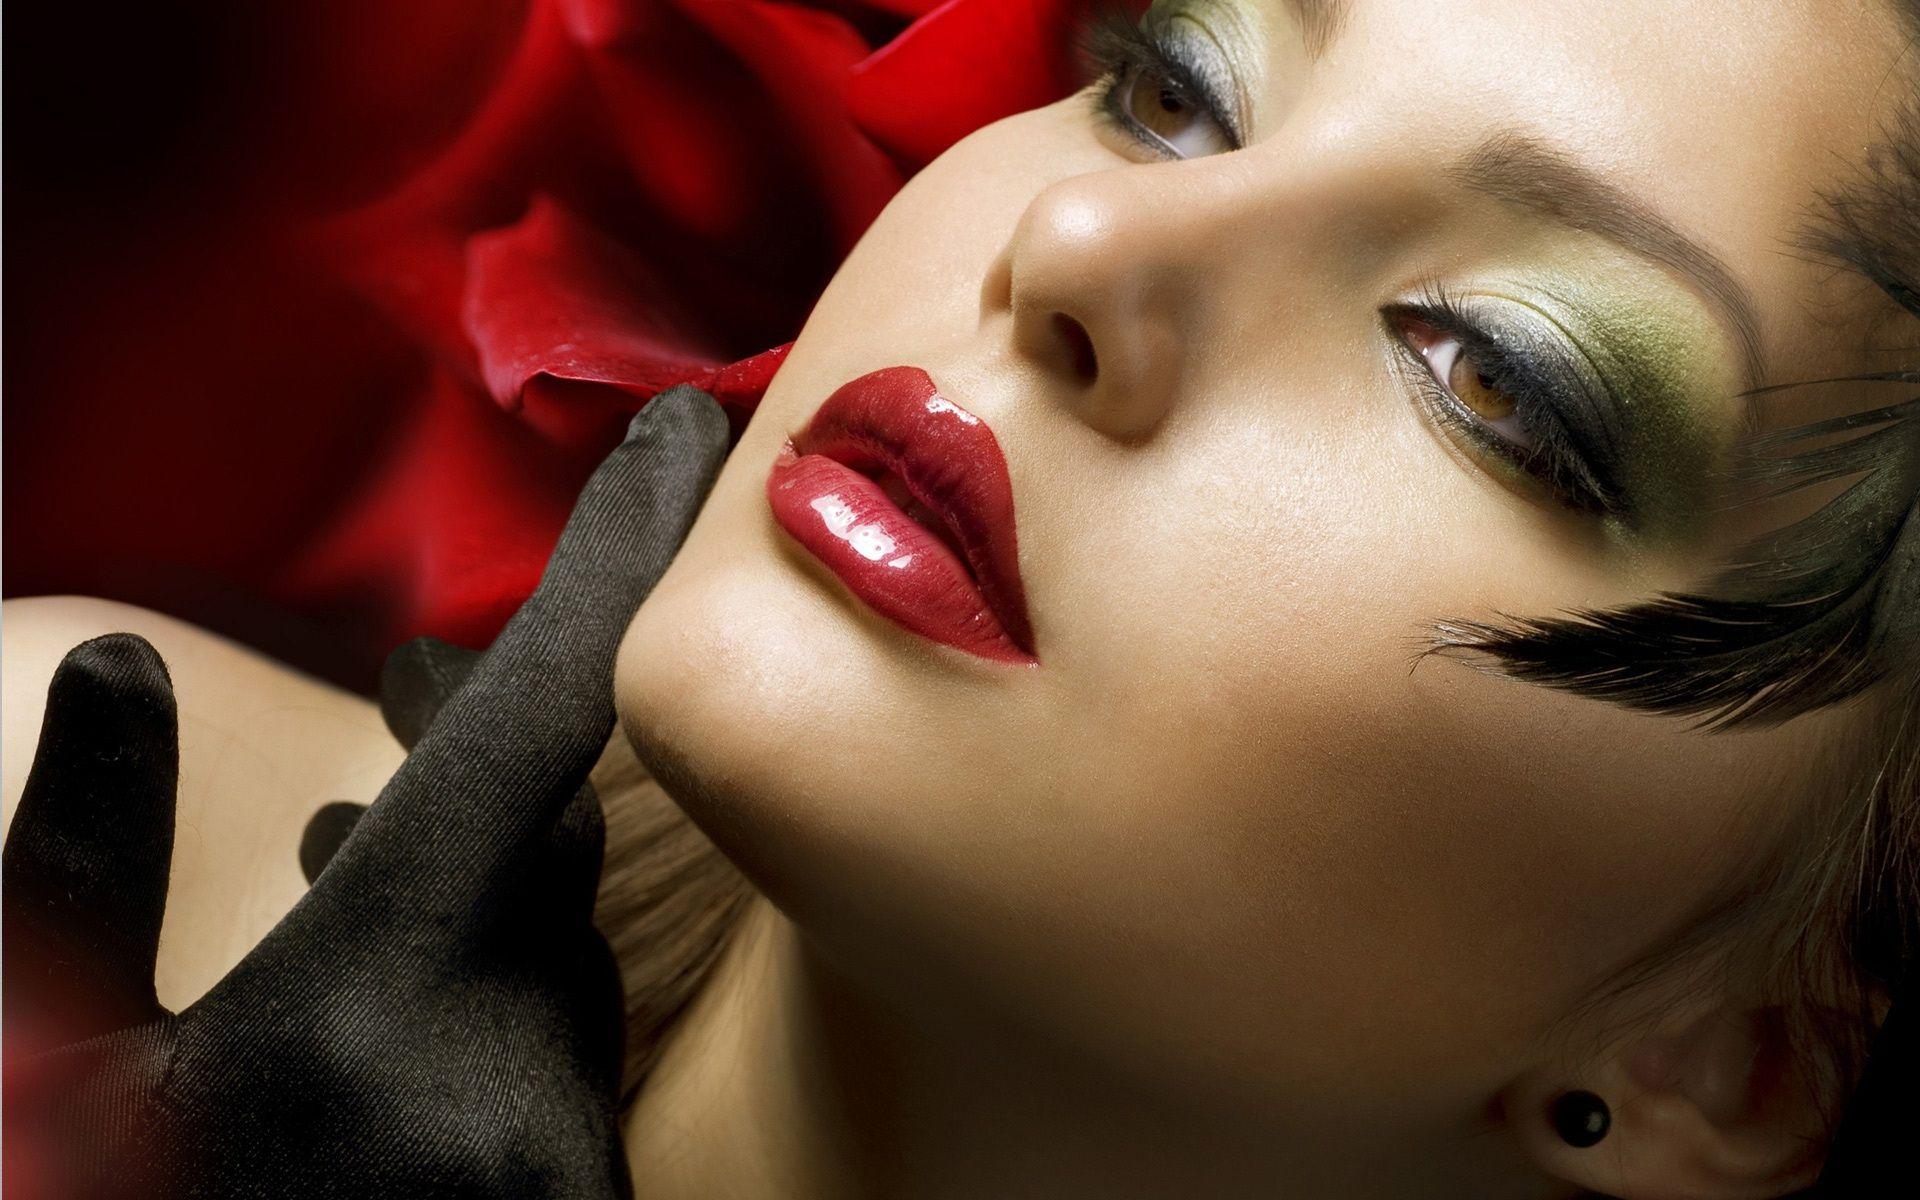 High Definition Girl Wallpaper - HDQ Cover Photos